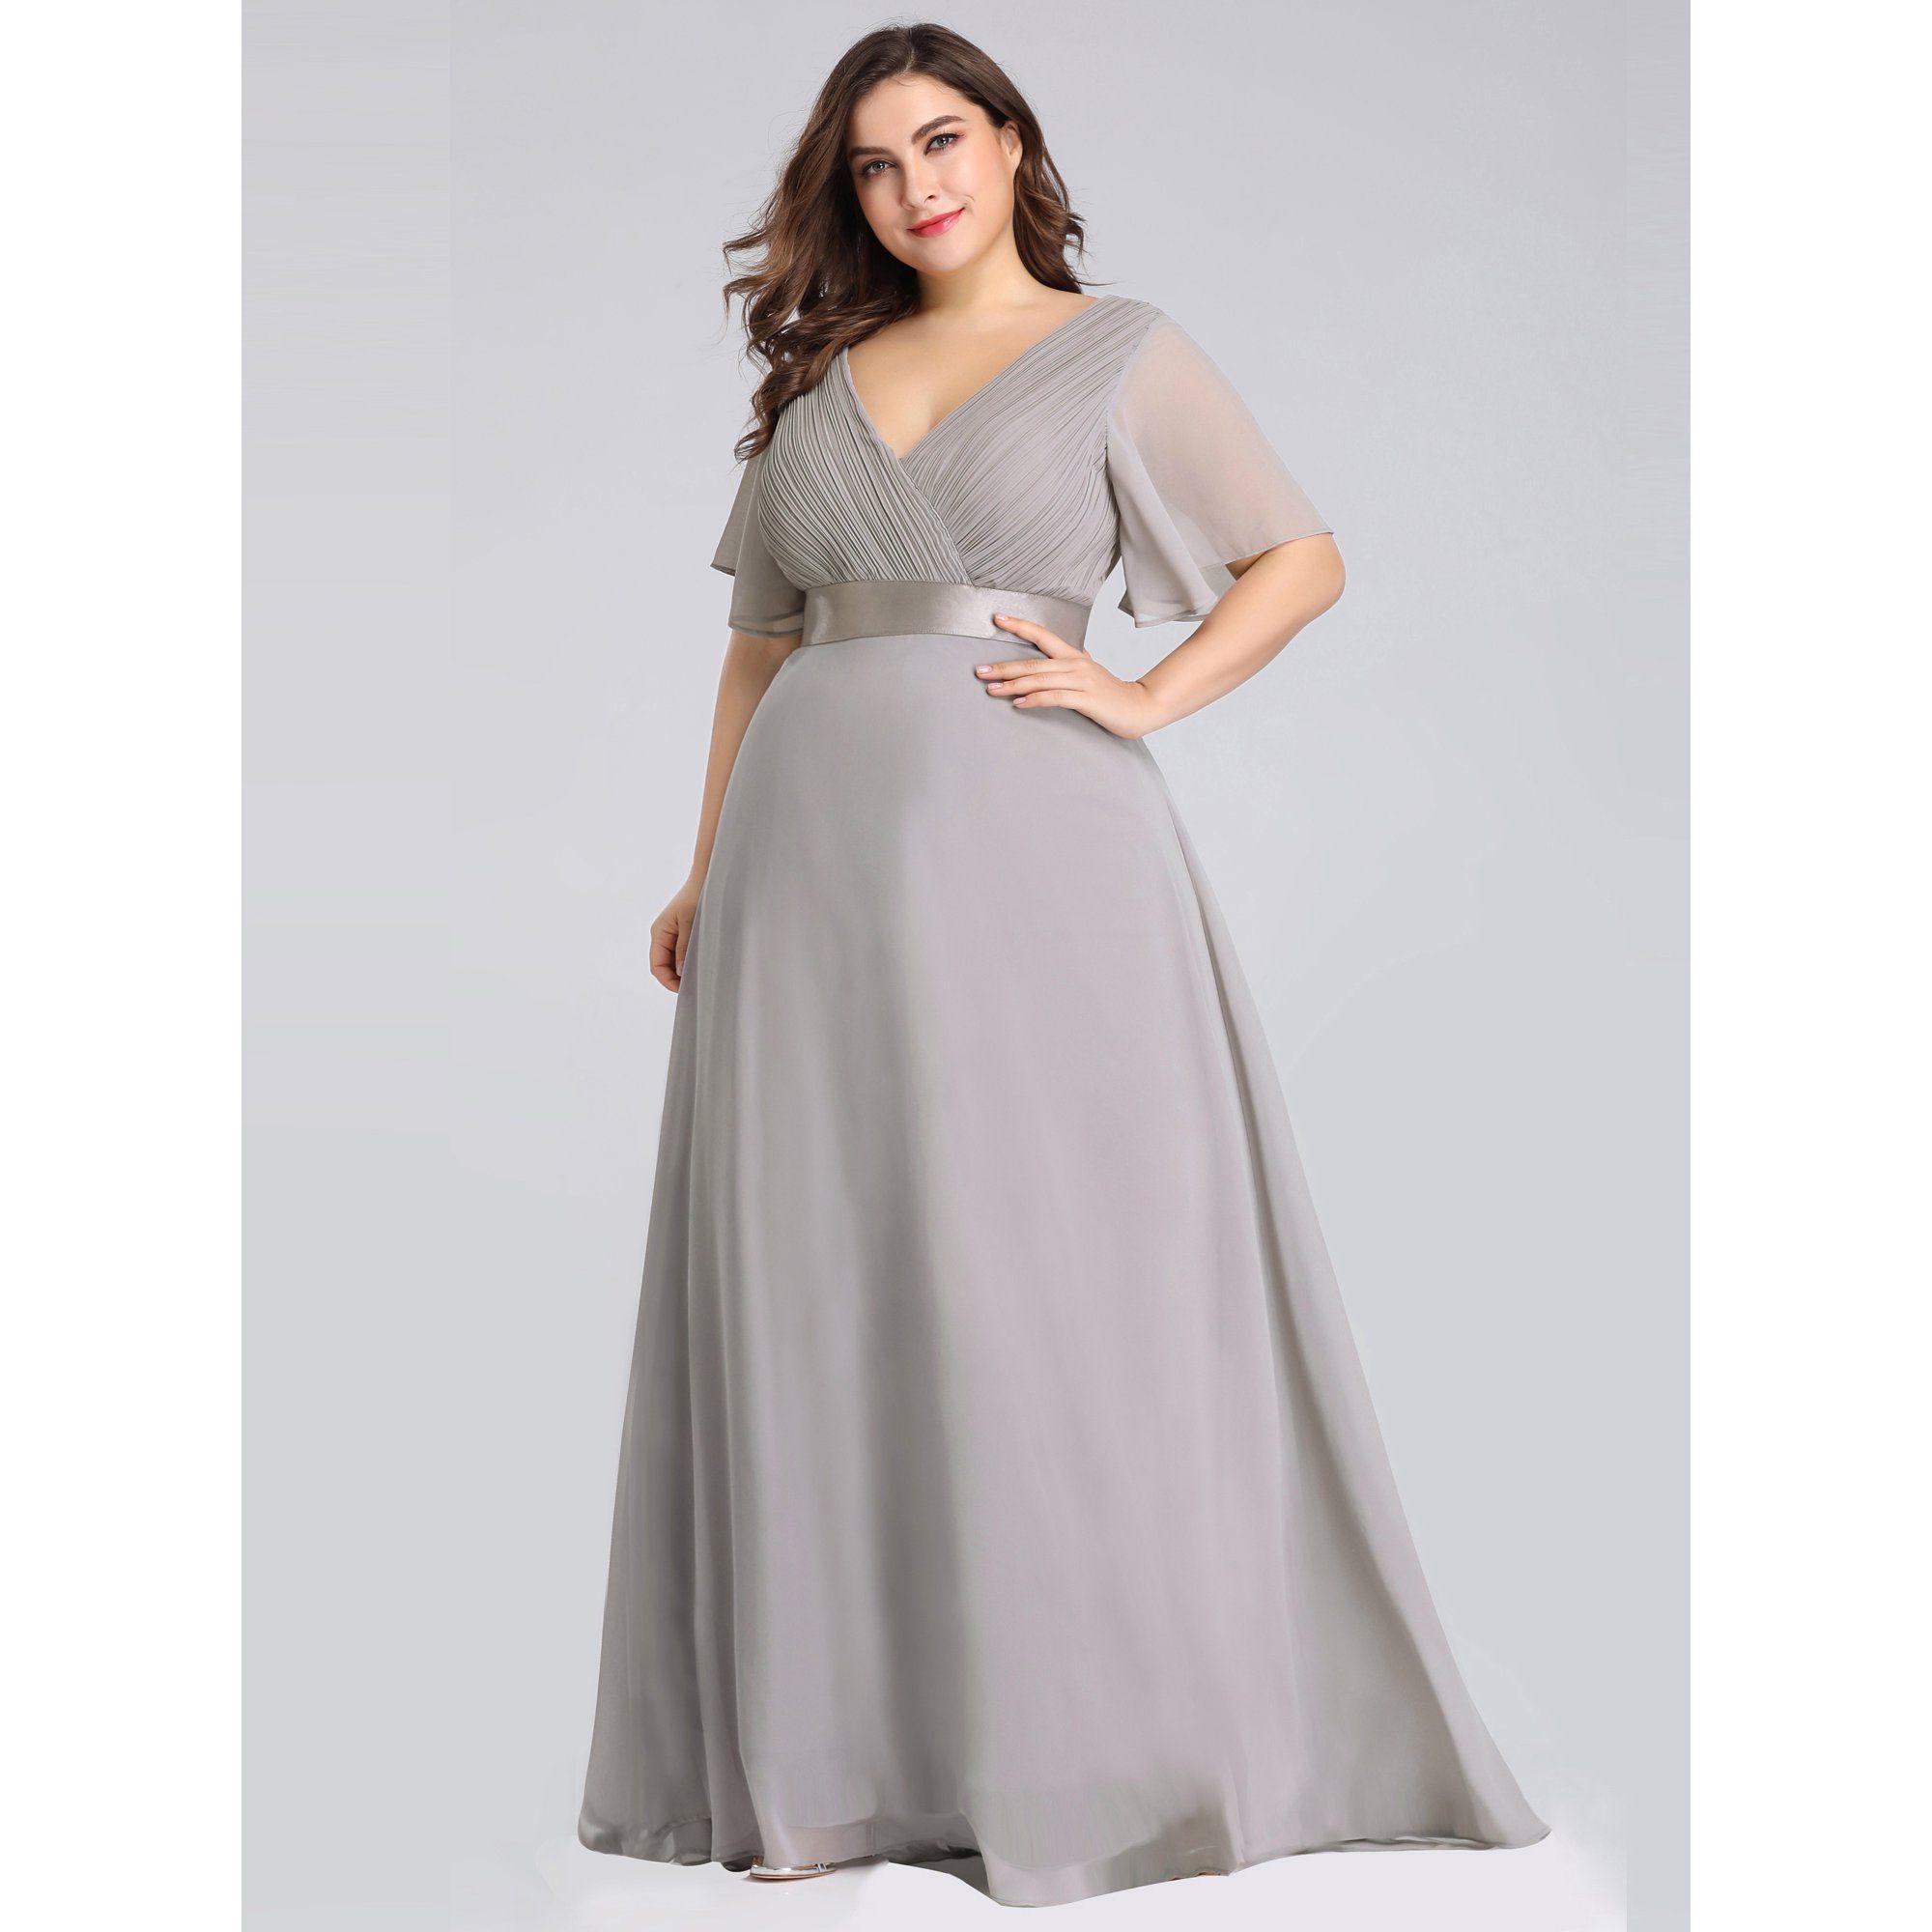 Ever Pretty Ever Pretty Womens Plus Size Fomral Evening Dresses For Women 98902 Green Us24 Walmart Com In 2021 Empire Waist Evening Dress Evening Dresses Party Gown Dress [ 2000 x 2000 Pixel ]